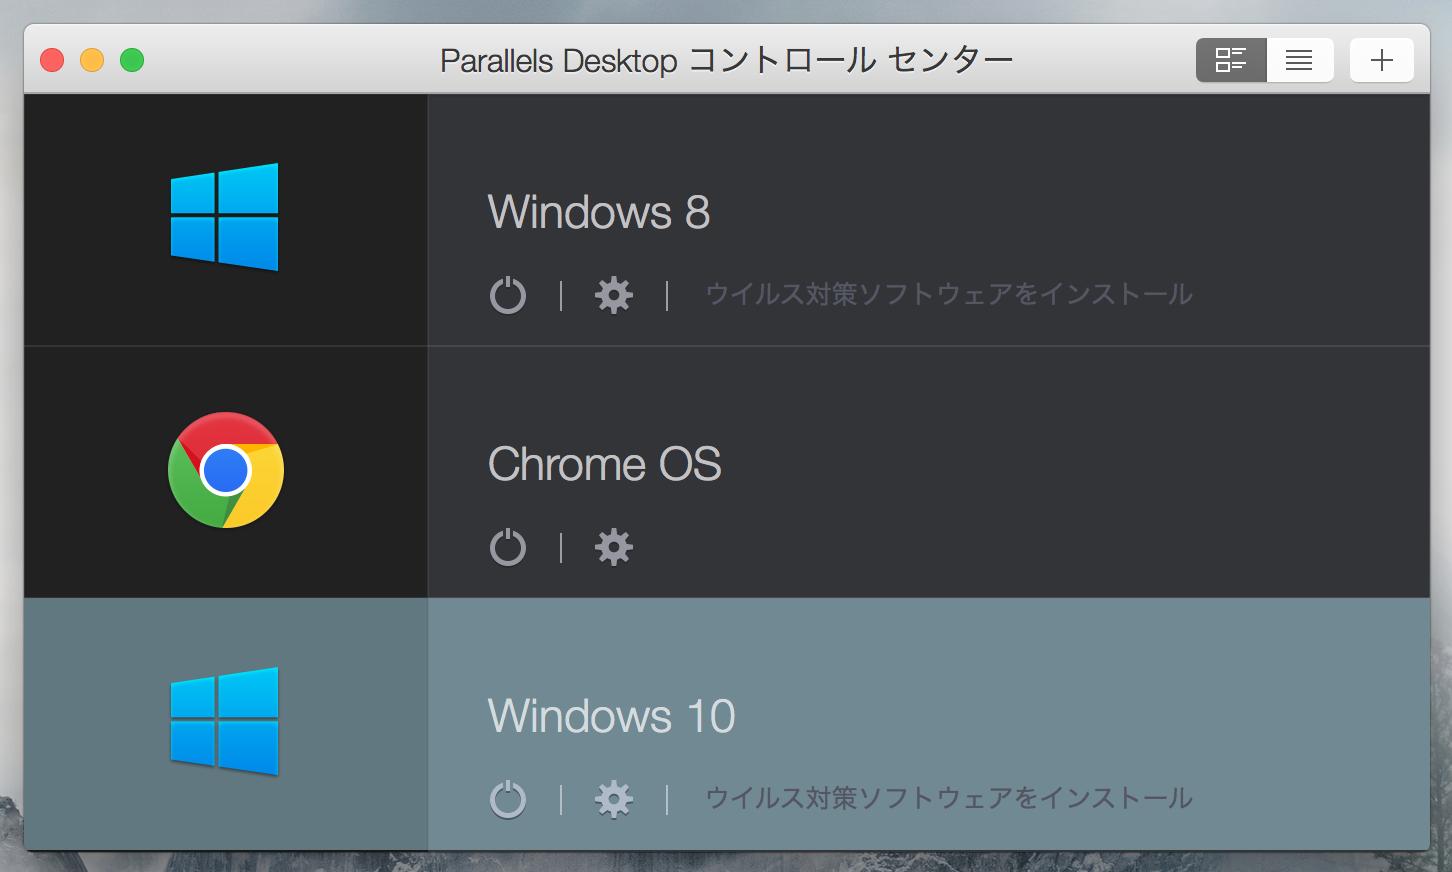 f:id:kazu-log:20150729101159p:plain